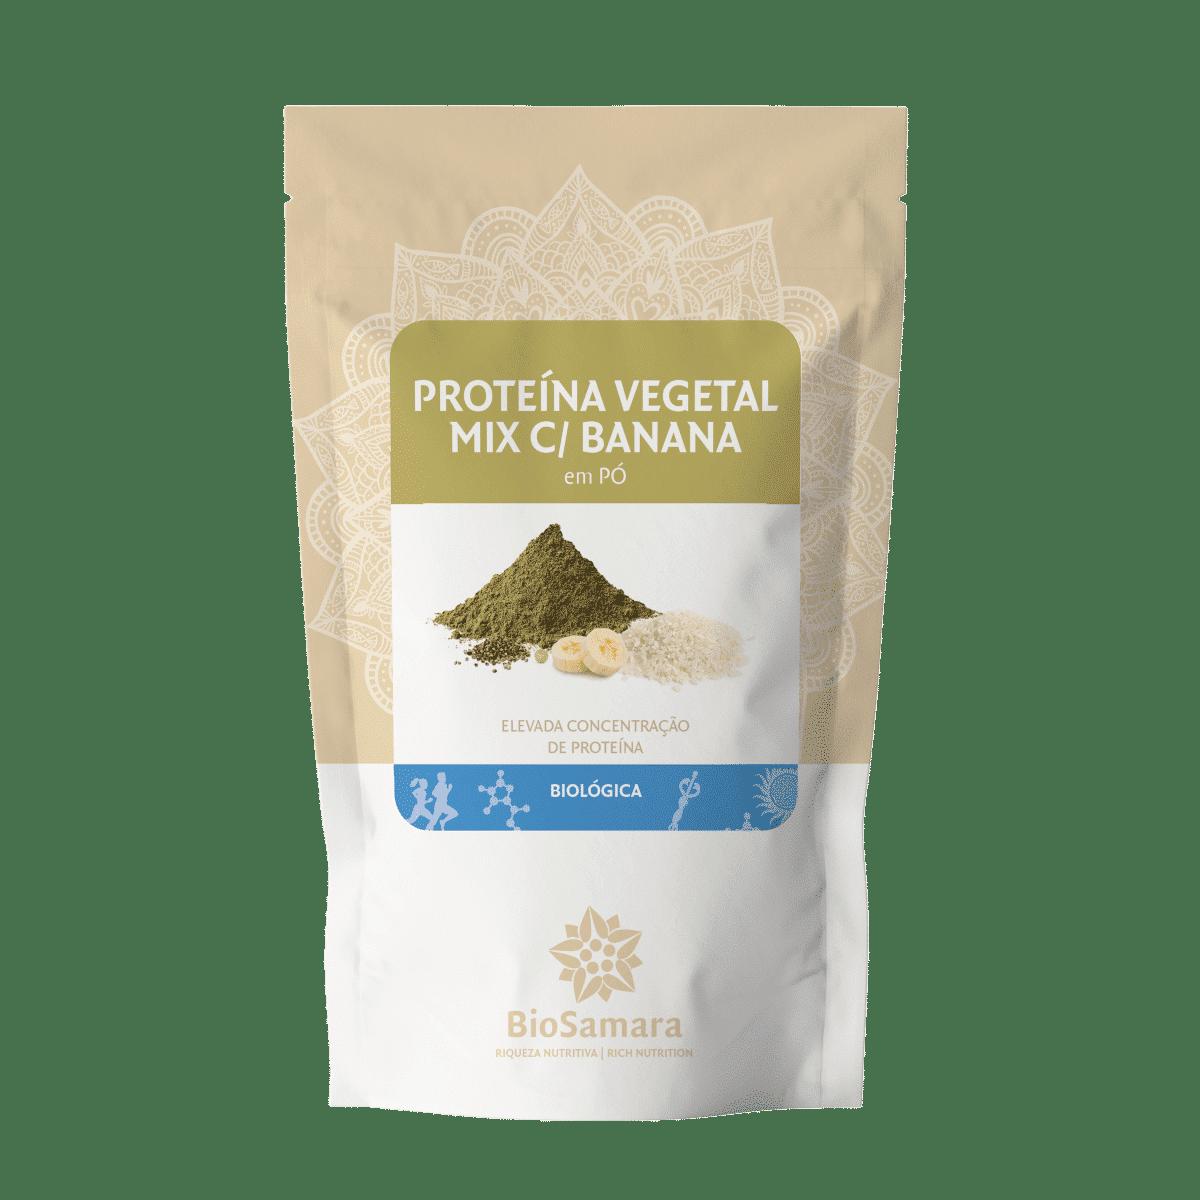 proteina vegetal mix banana po bio biosamara